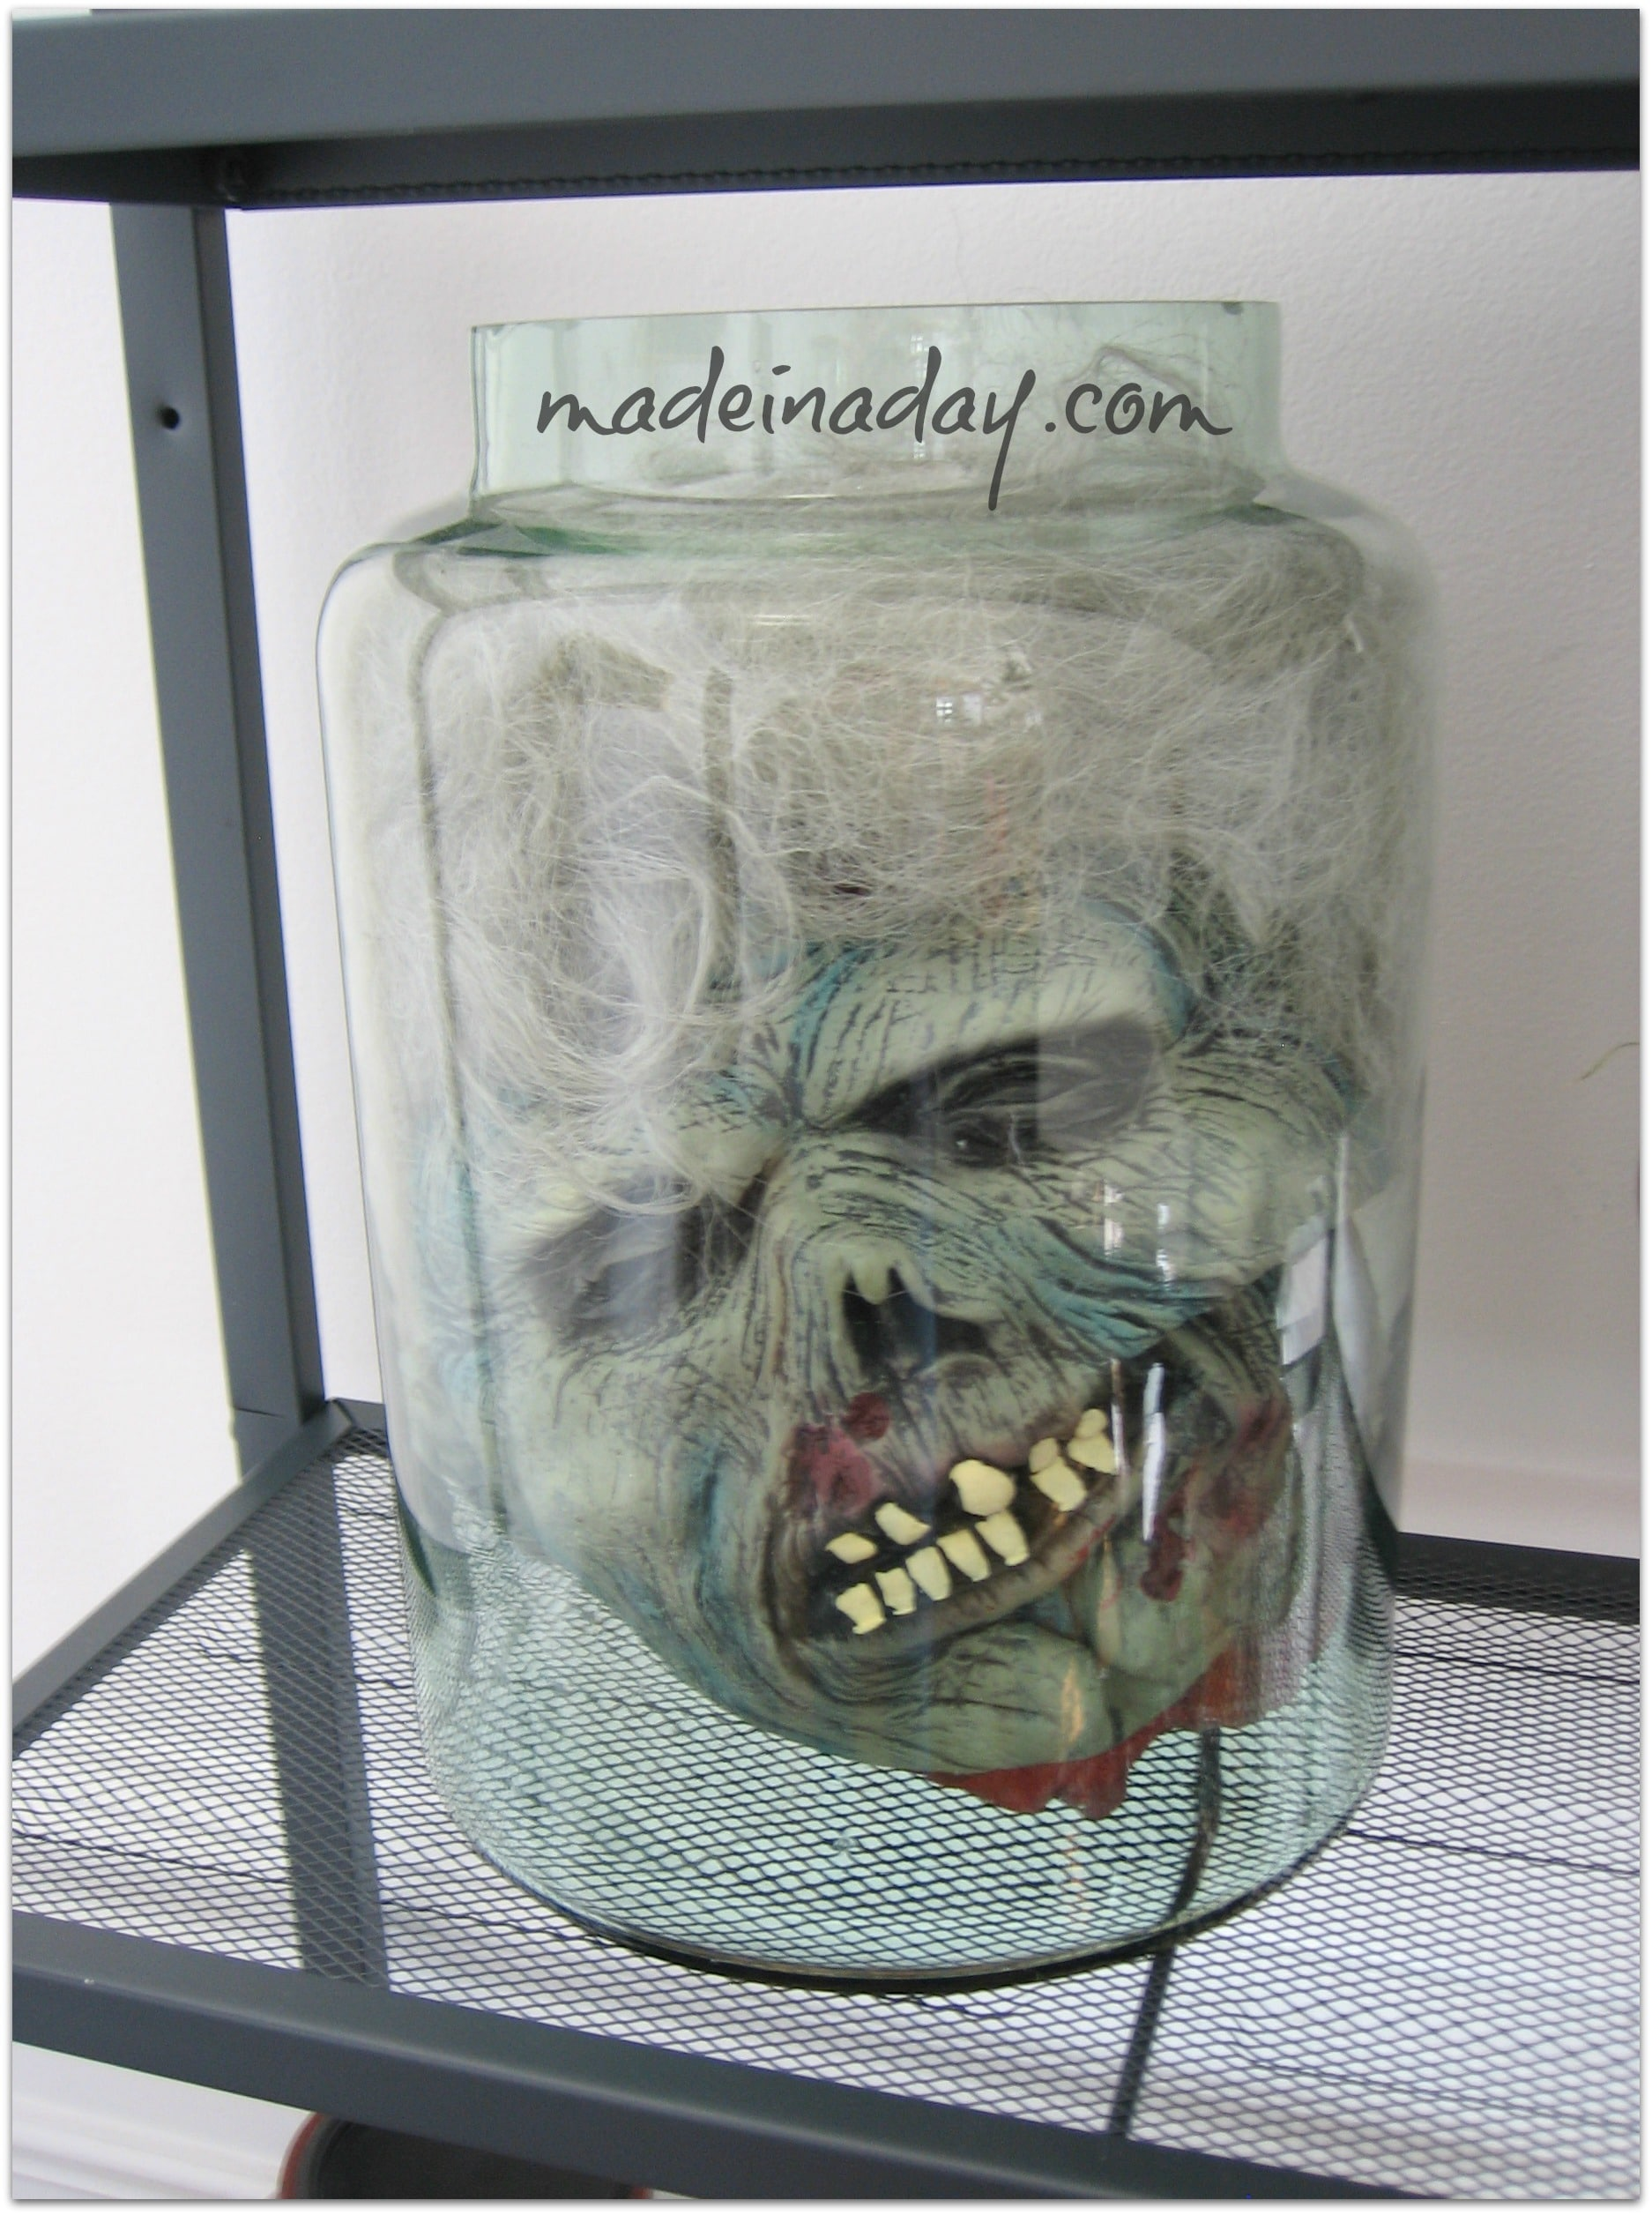 Halloween Head in a Jar prop